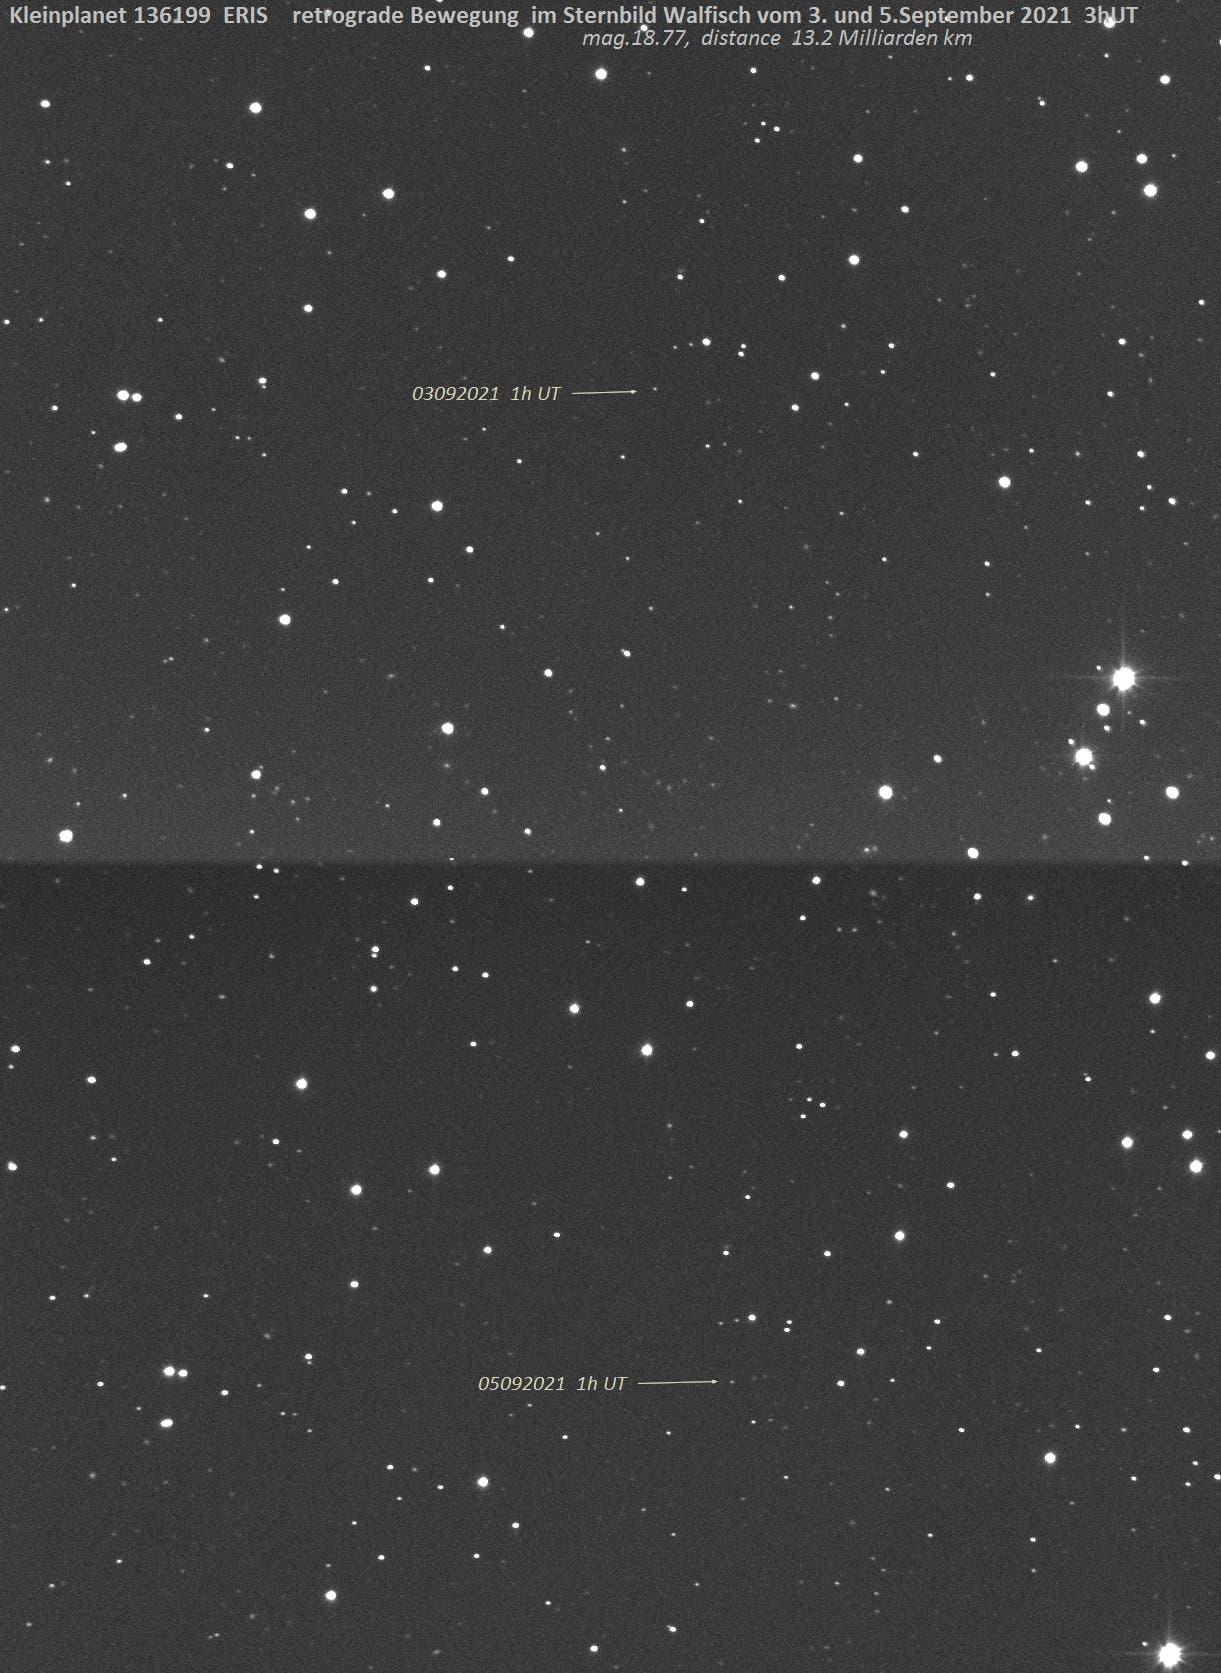 Kleinplanet Eris retrograd in Cetus